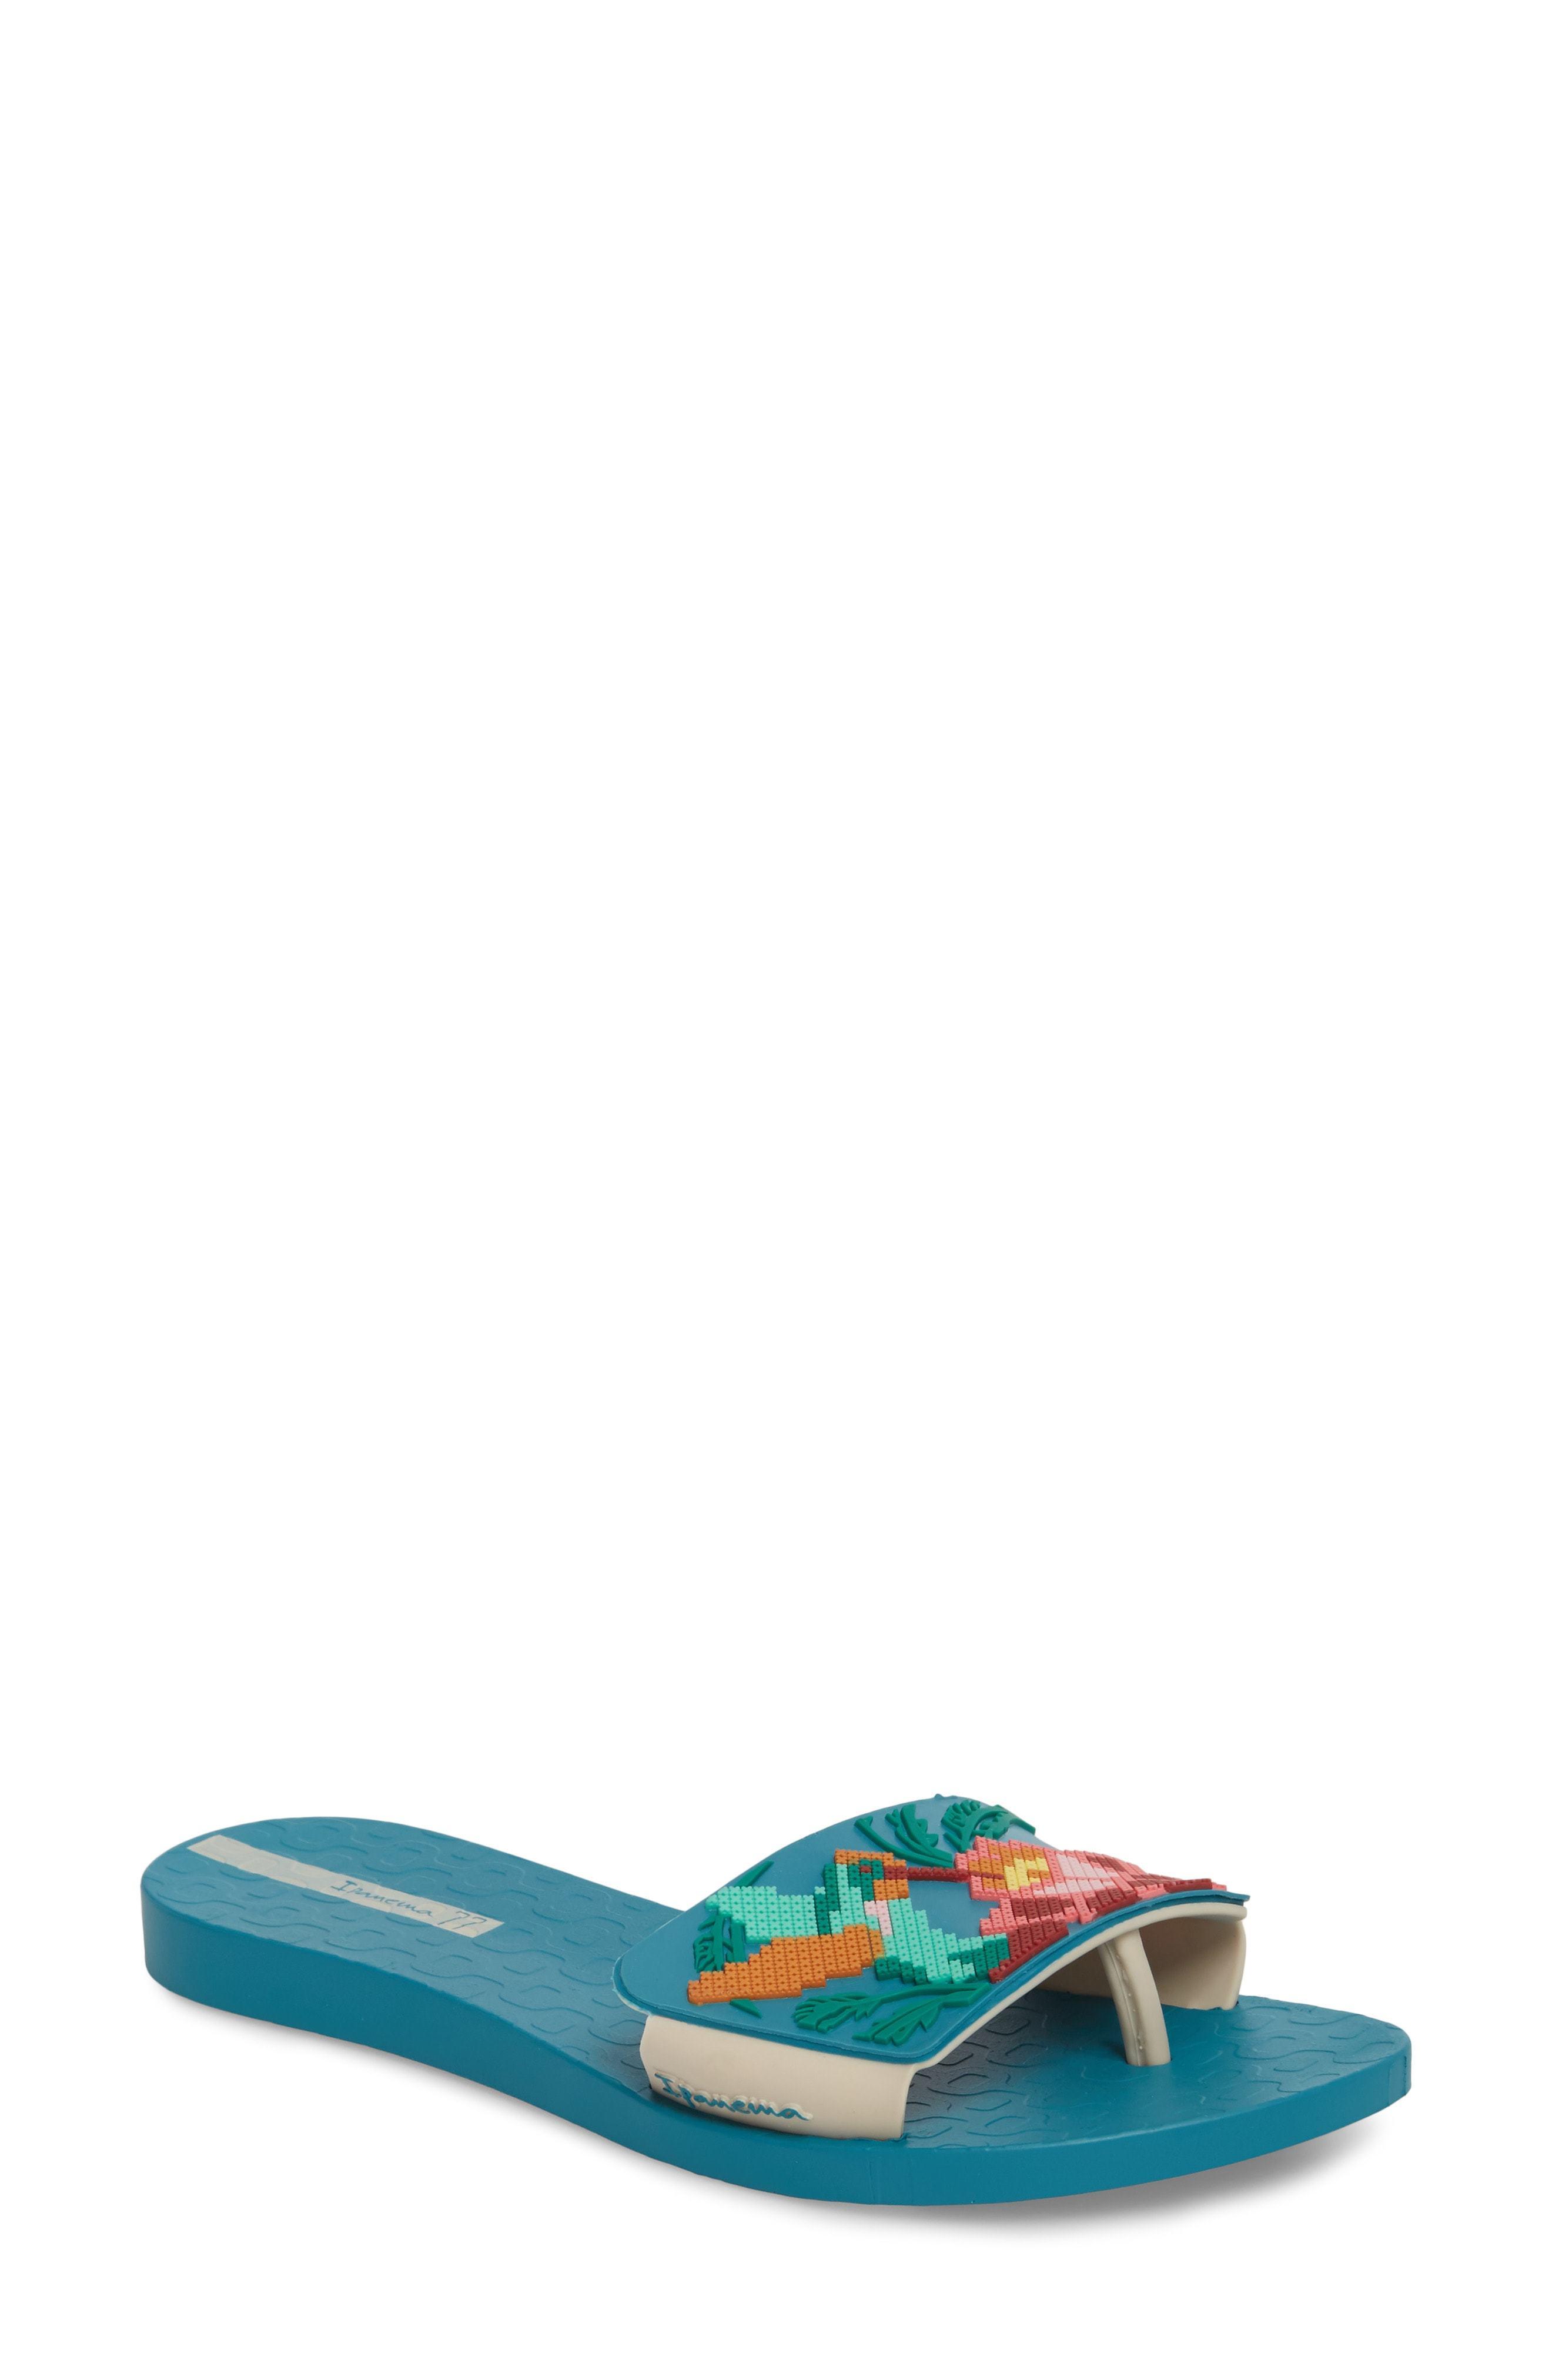 3eaa018955f ... Ipanema Nectar Floral Slide Sandal